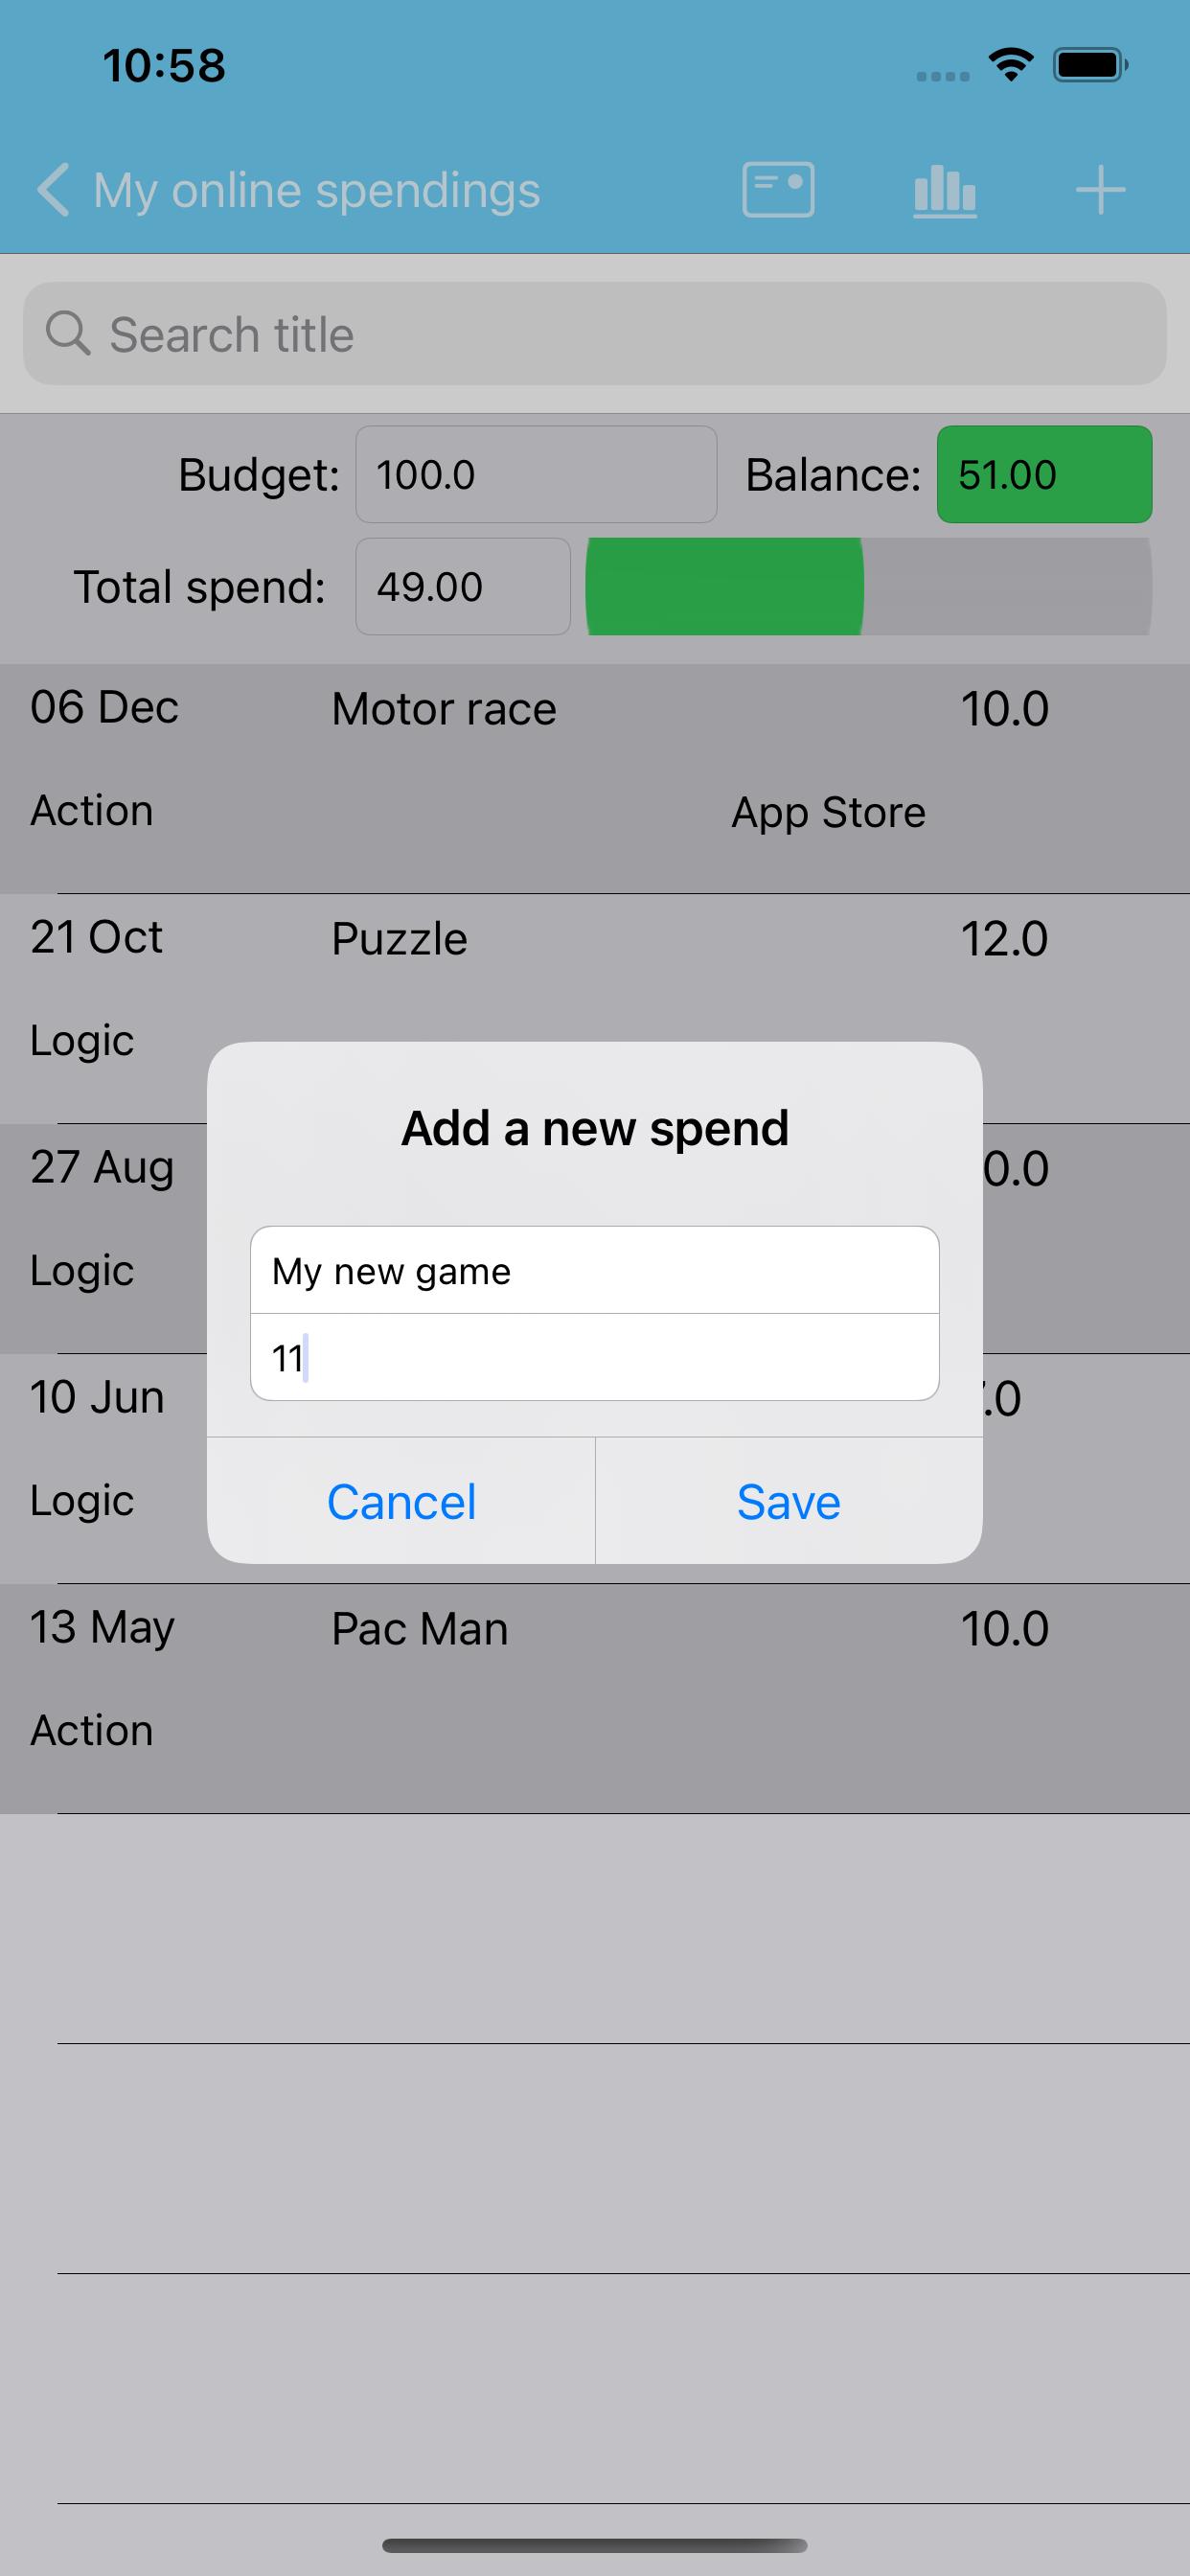 Add a new spend